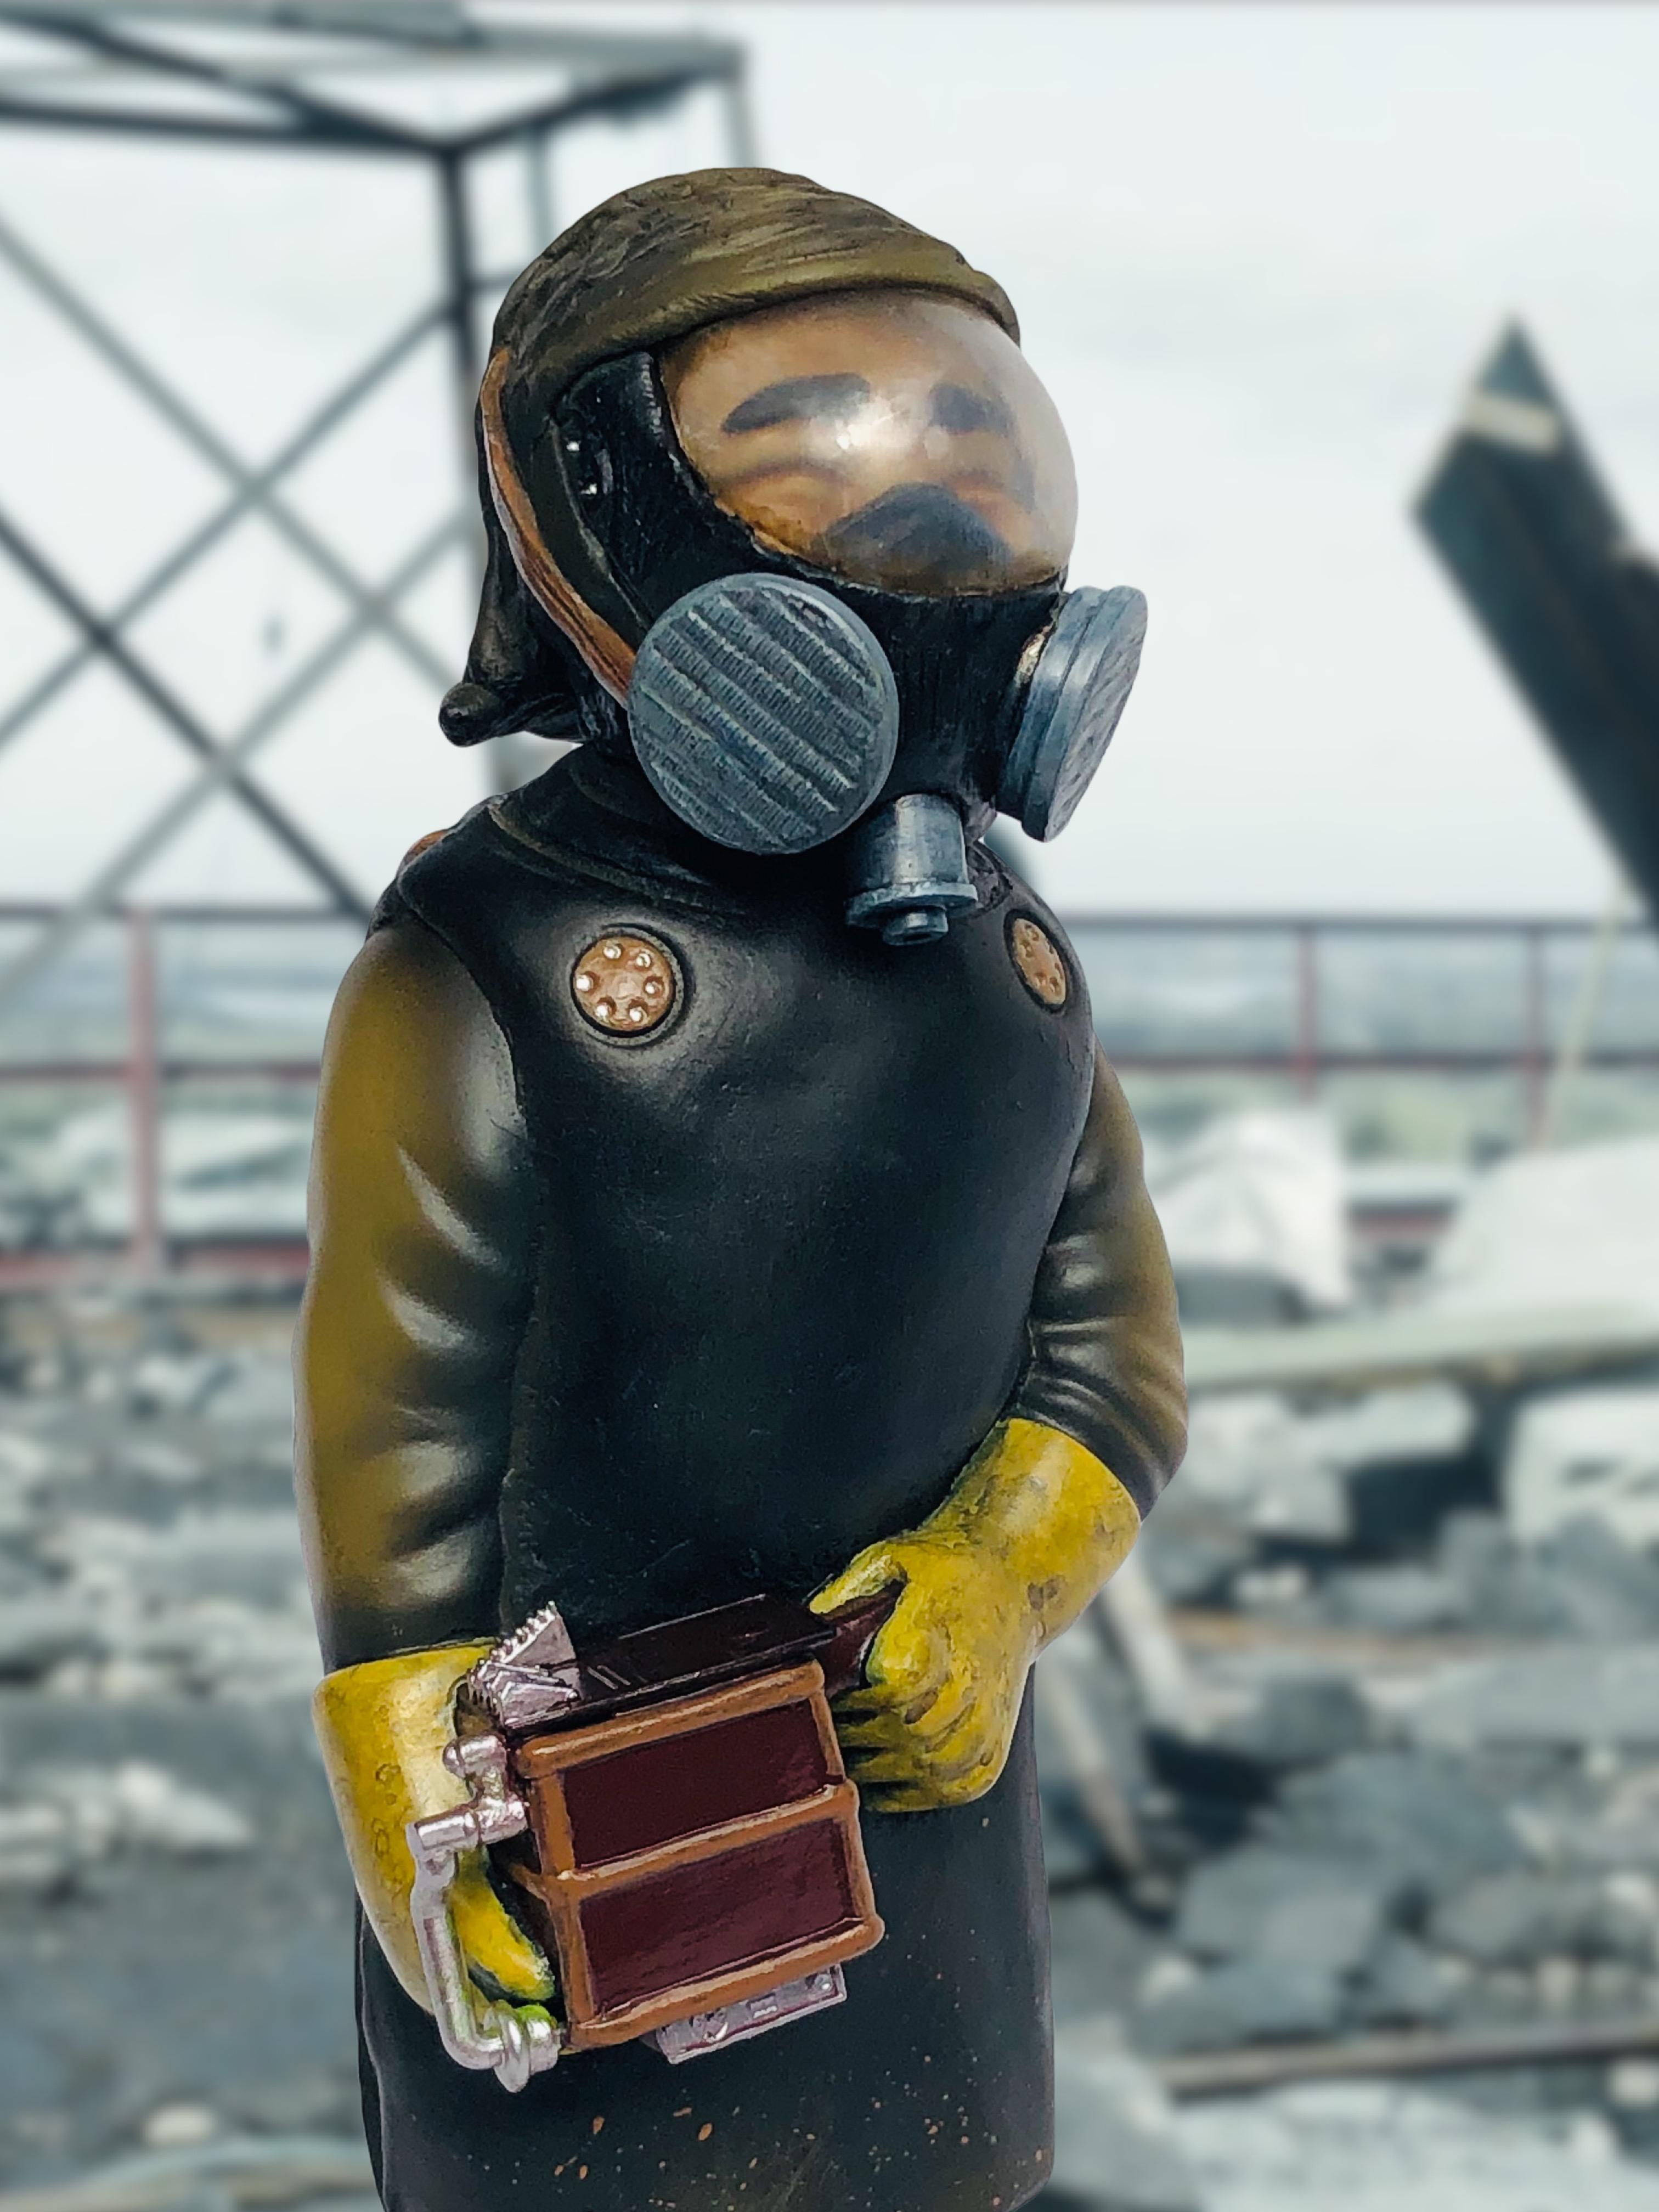 Sofubi-man Custom Show Miscreation Toys chernobyl radiation suit